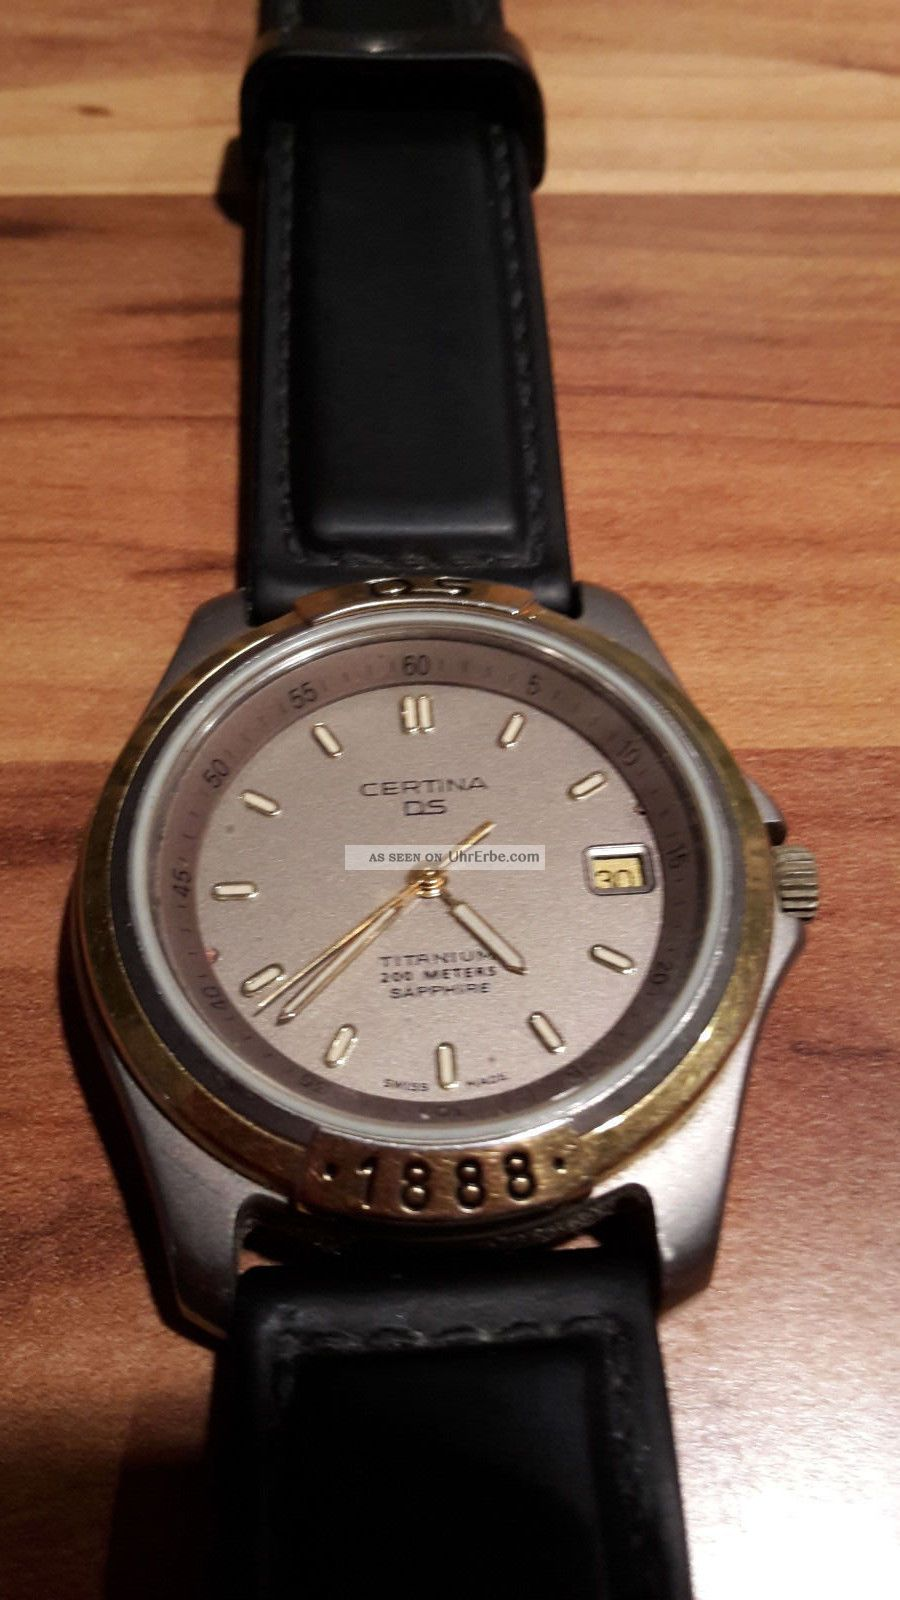 Certina Ds 1888 Saphire Quartz Herren Armbanduhr Top Gepfelgt Armbanduhren Bild